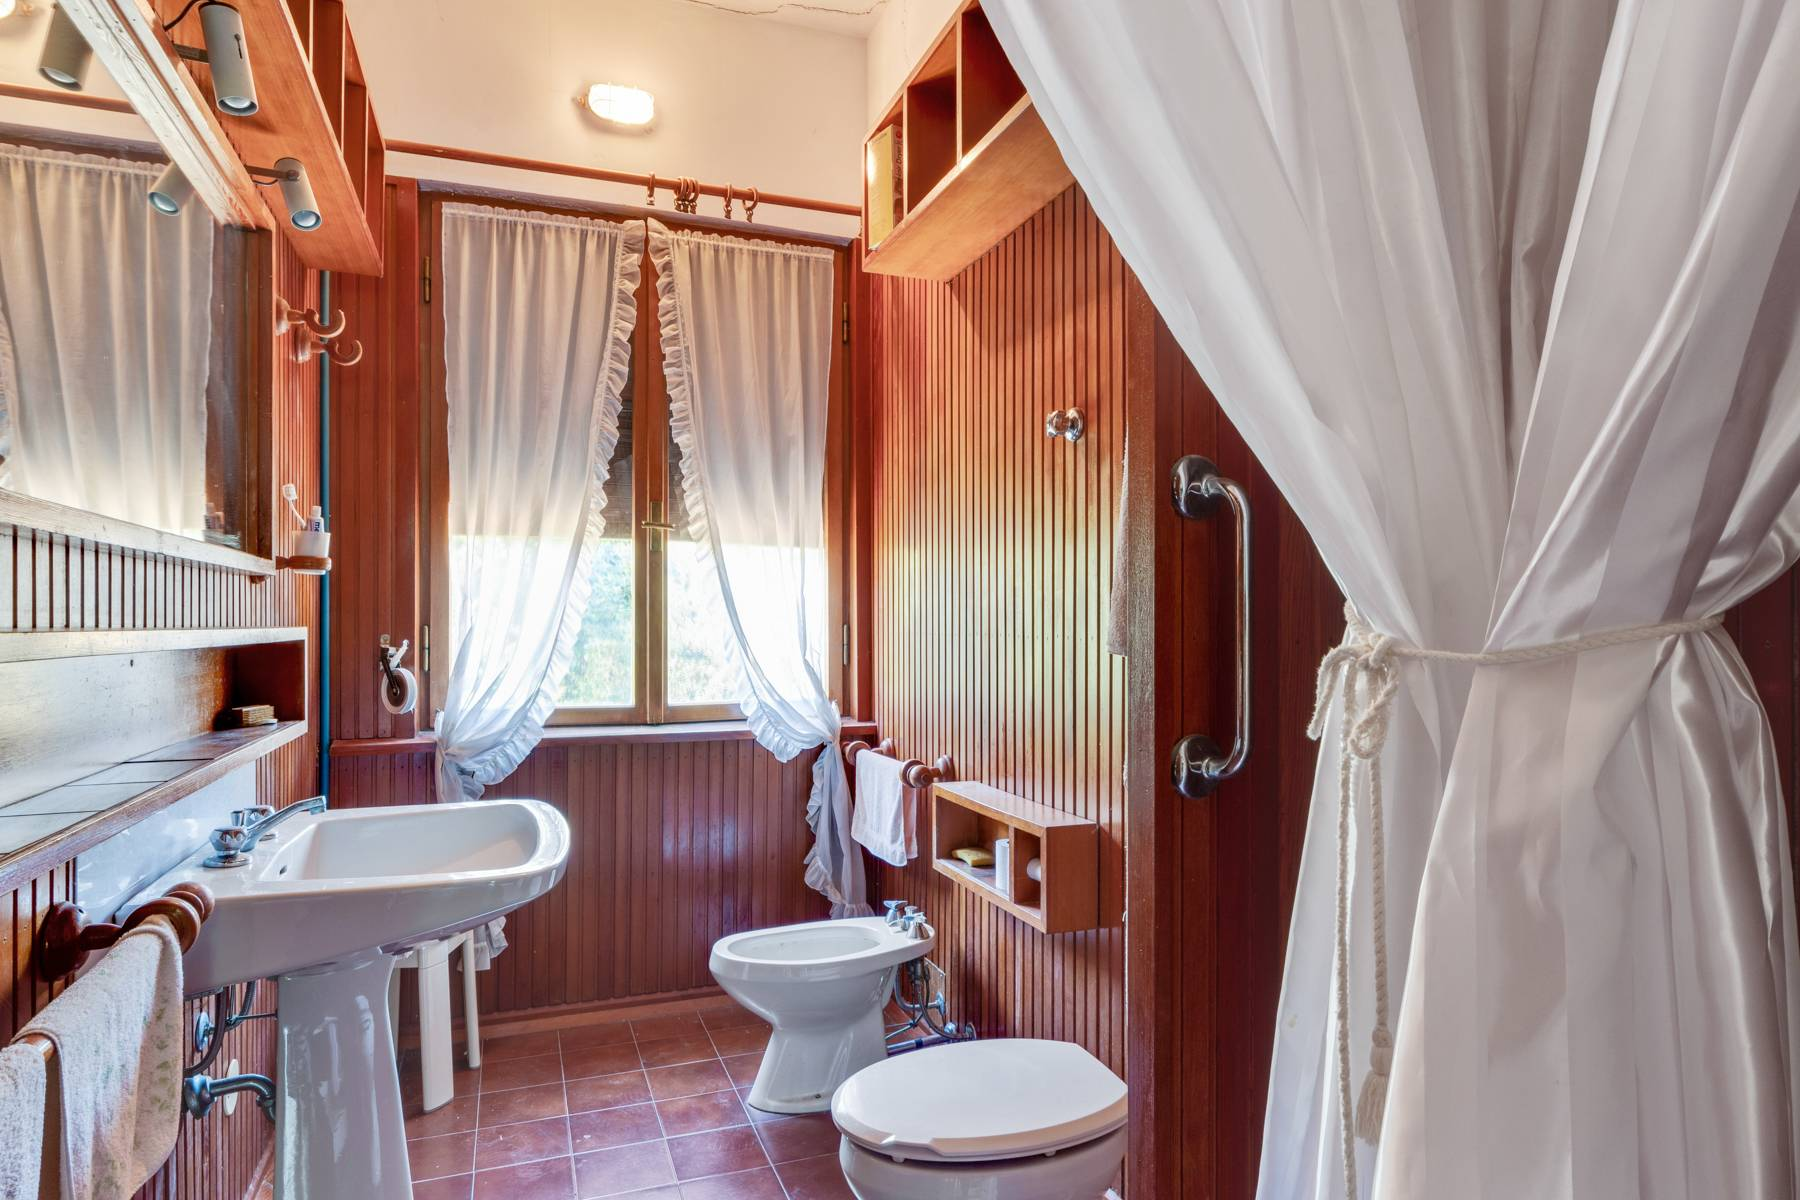 Villa in Vendita a Stresa: 5 locali, 150 mq - Foto 22